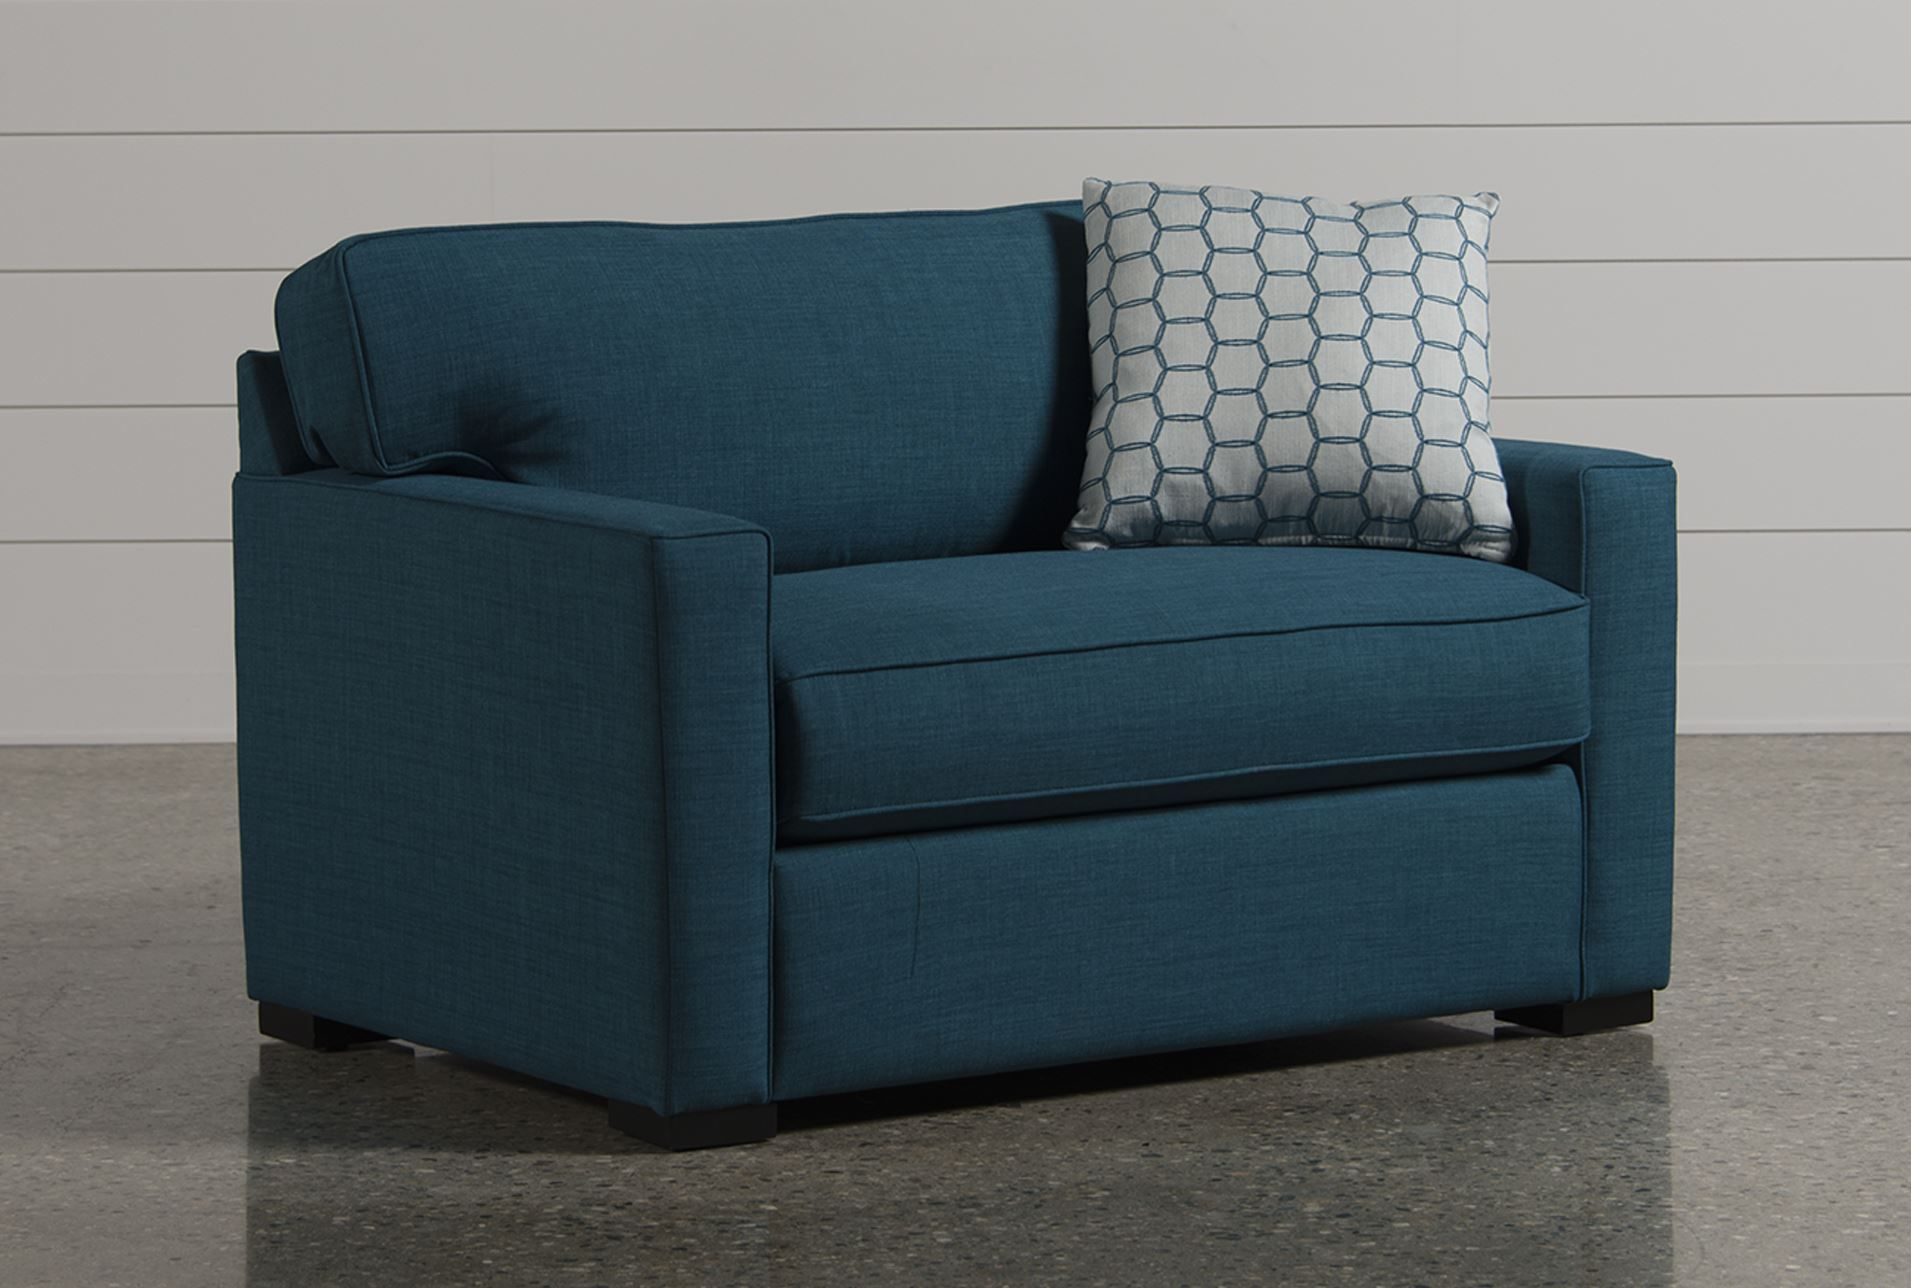 Superb Silas Memory Foam Twin Sleeper In 2019 Living Room Short Links Chair Design For Home Short Linksinfo